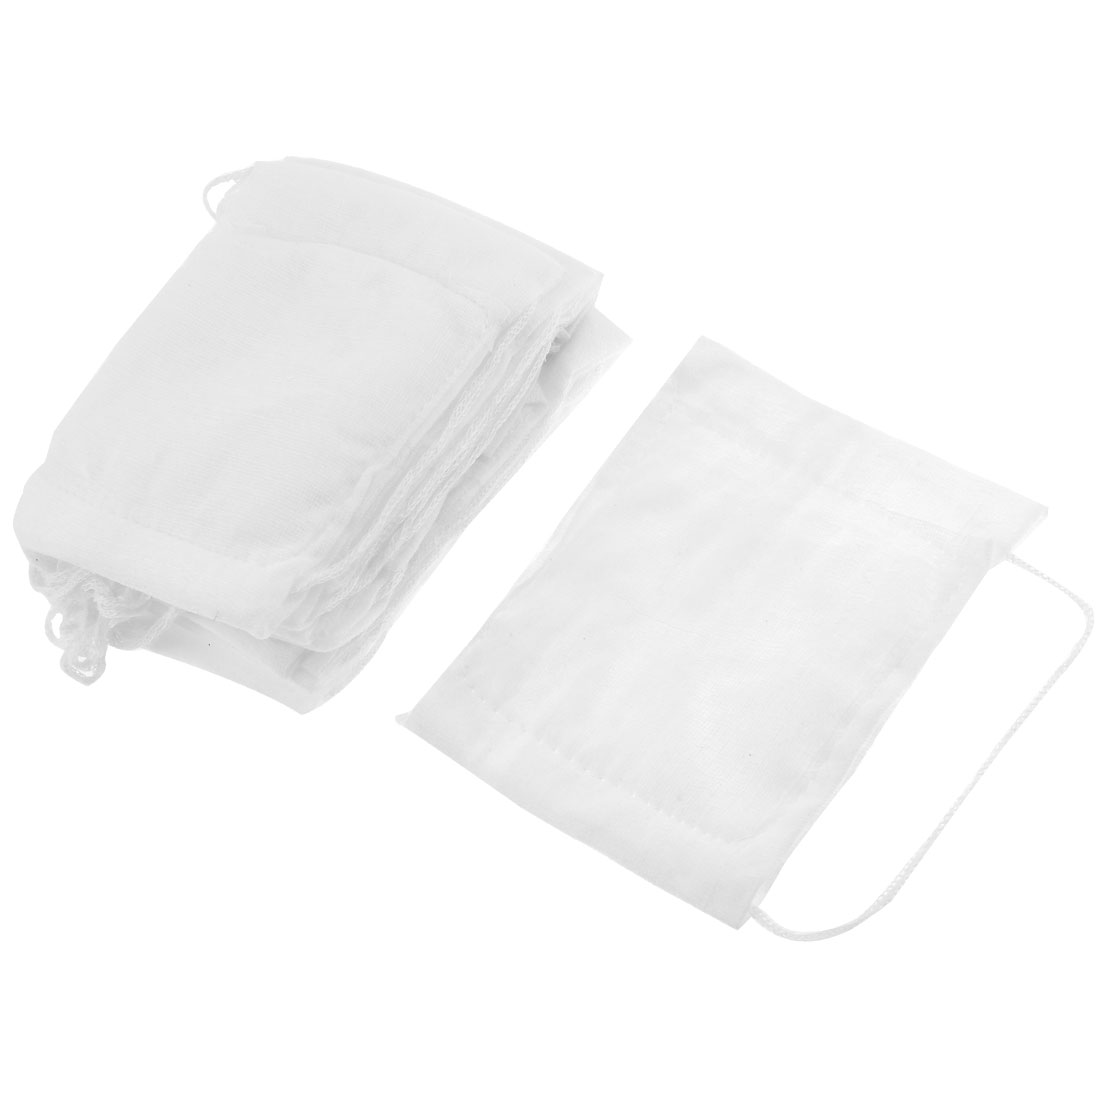 White Rectangle Shape Cotton Gauze Face Mask 10 Pcs